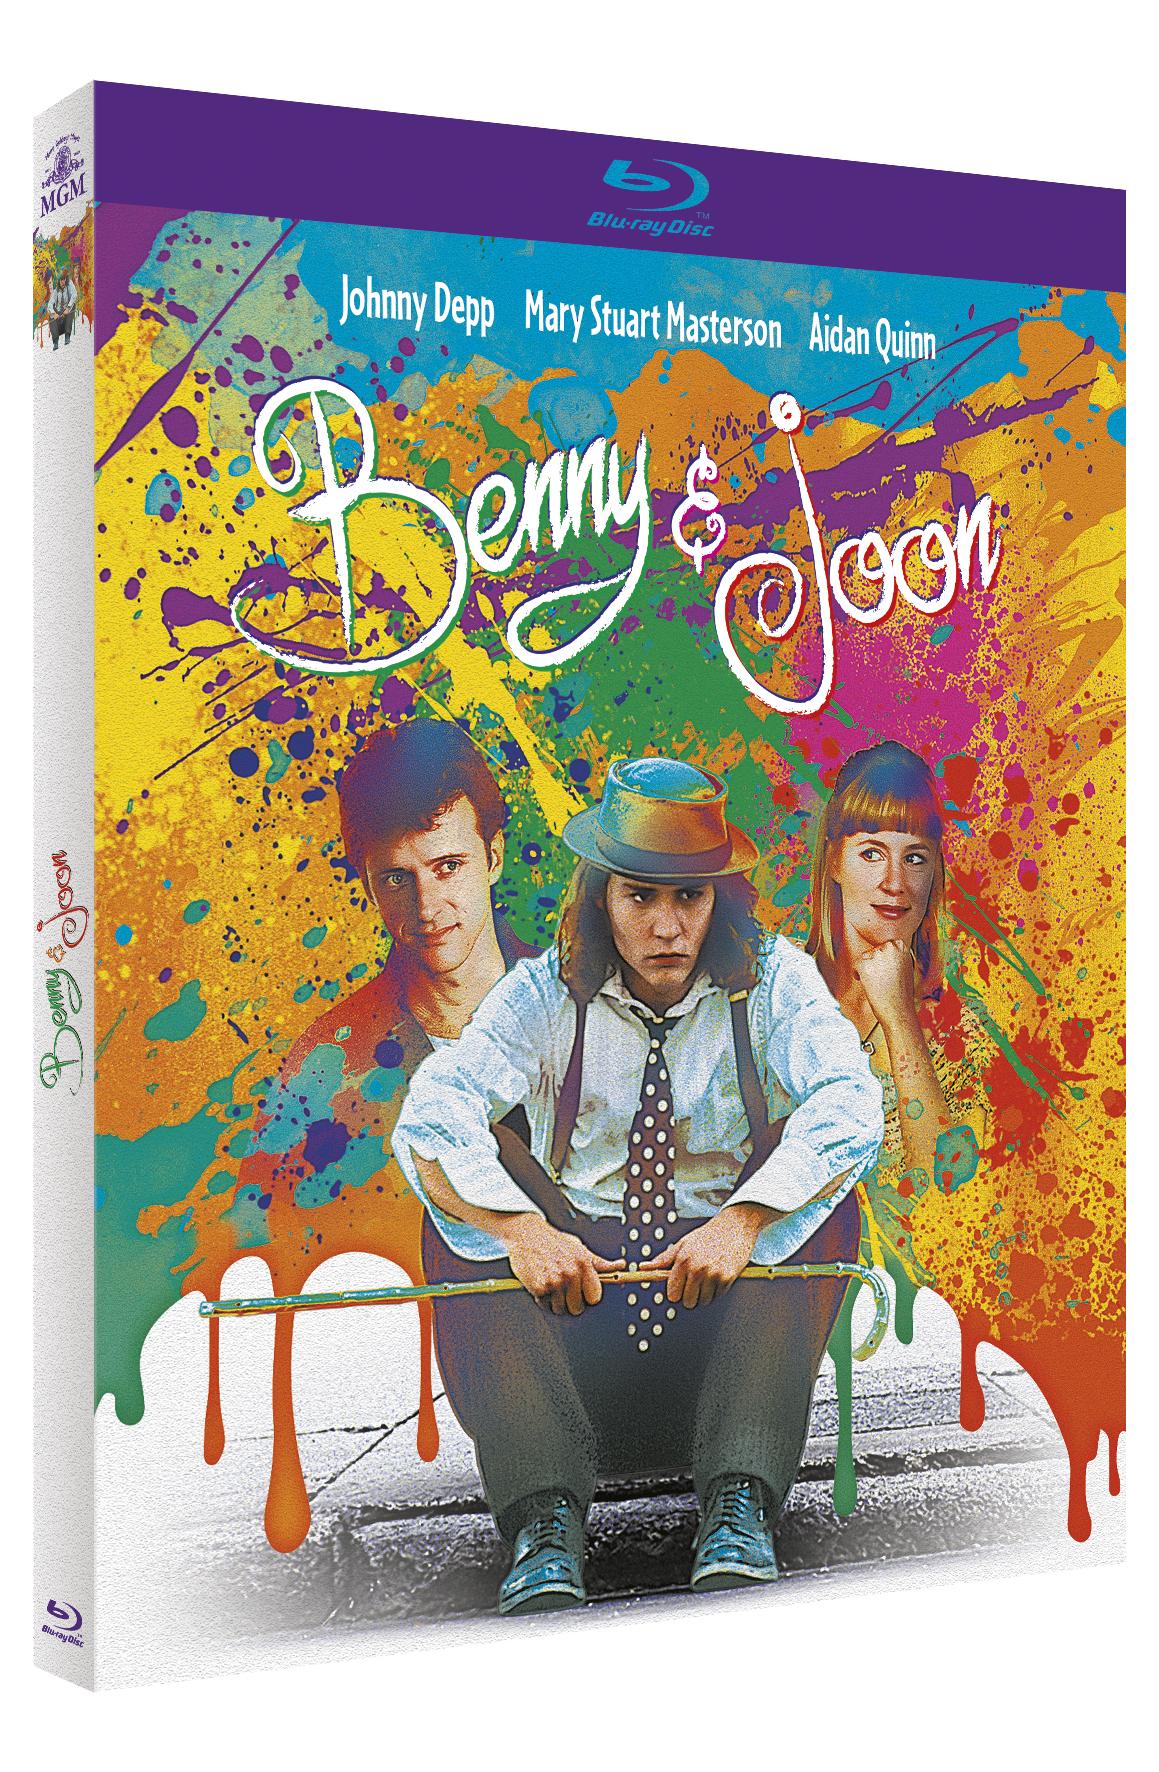 BENNY & JOON (1993) - BRD